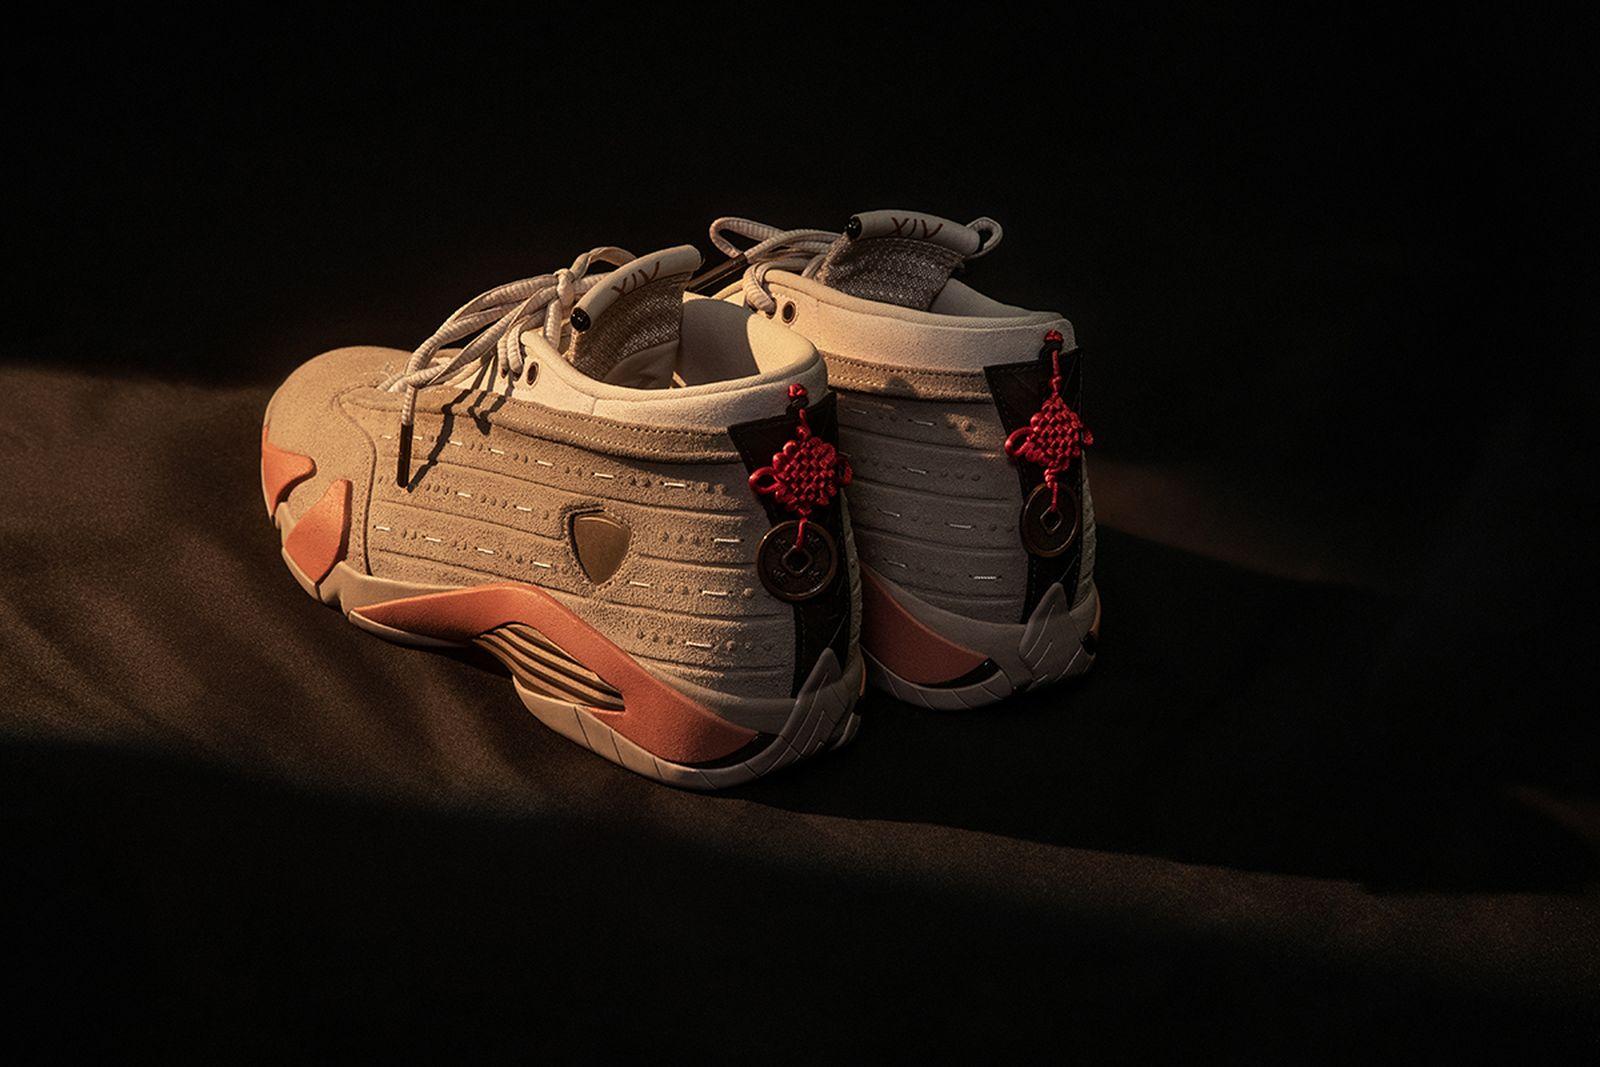 clot-air-jordan-14-low-terracotta-release-info-04